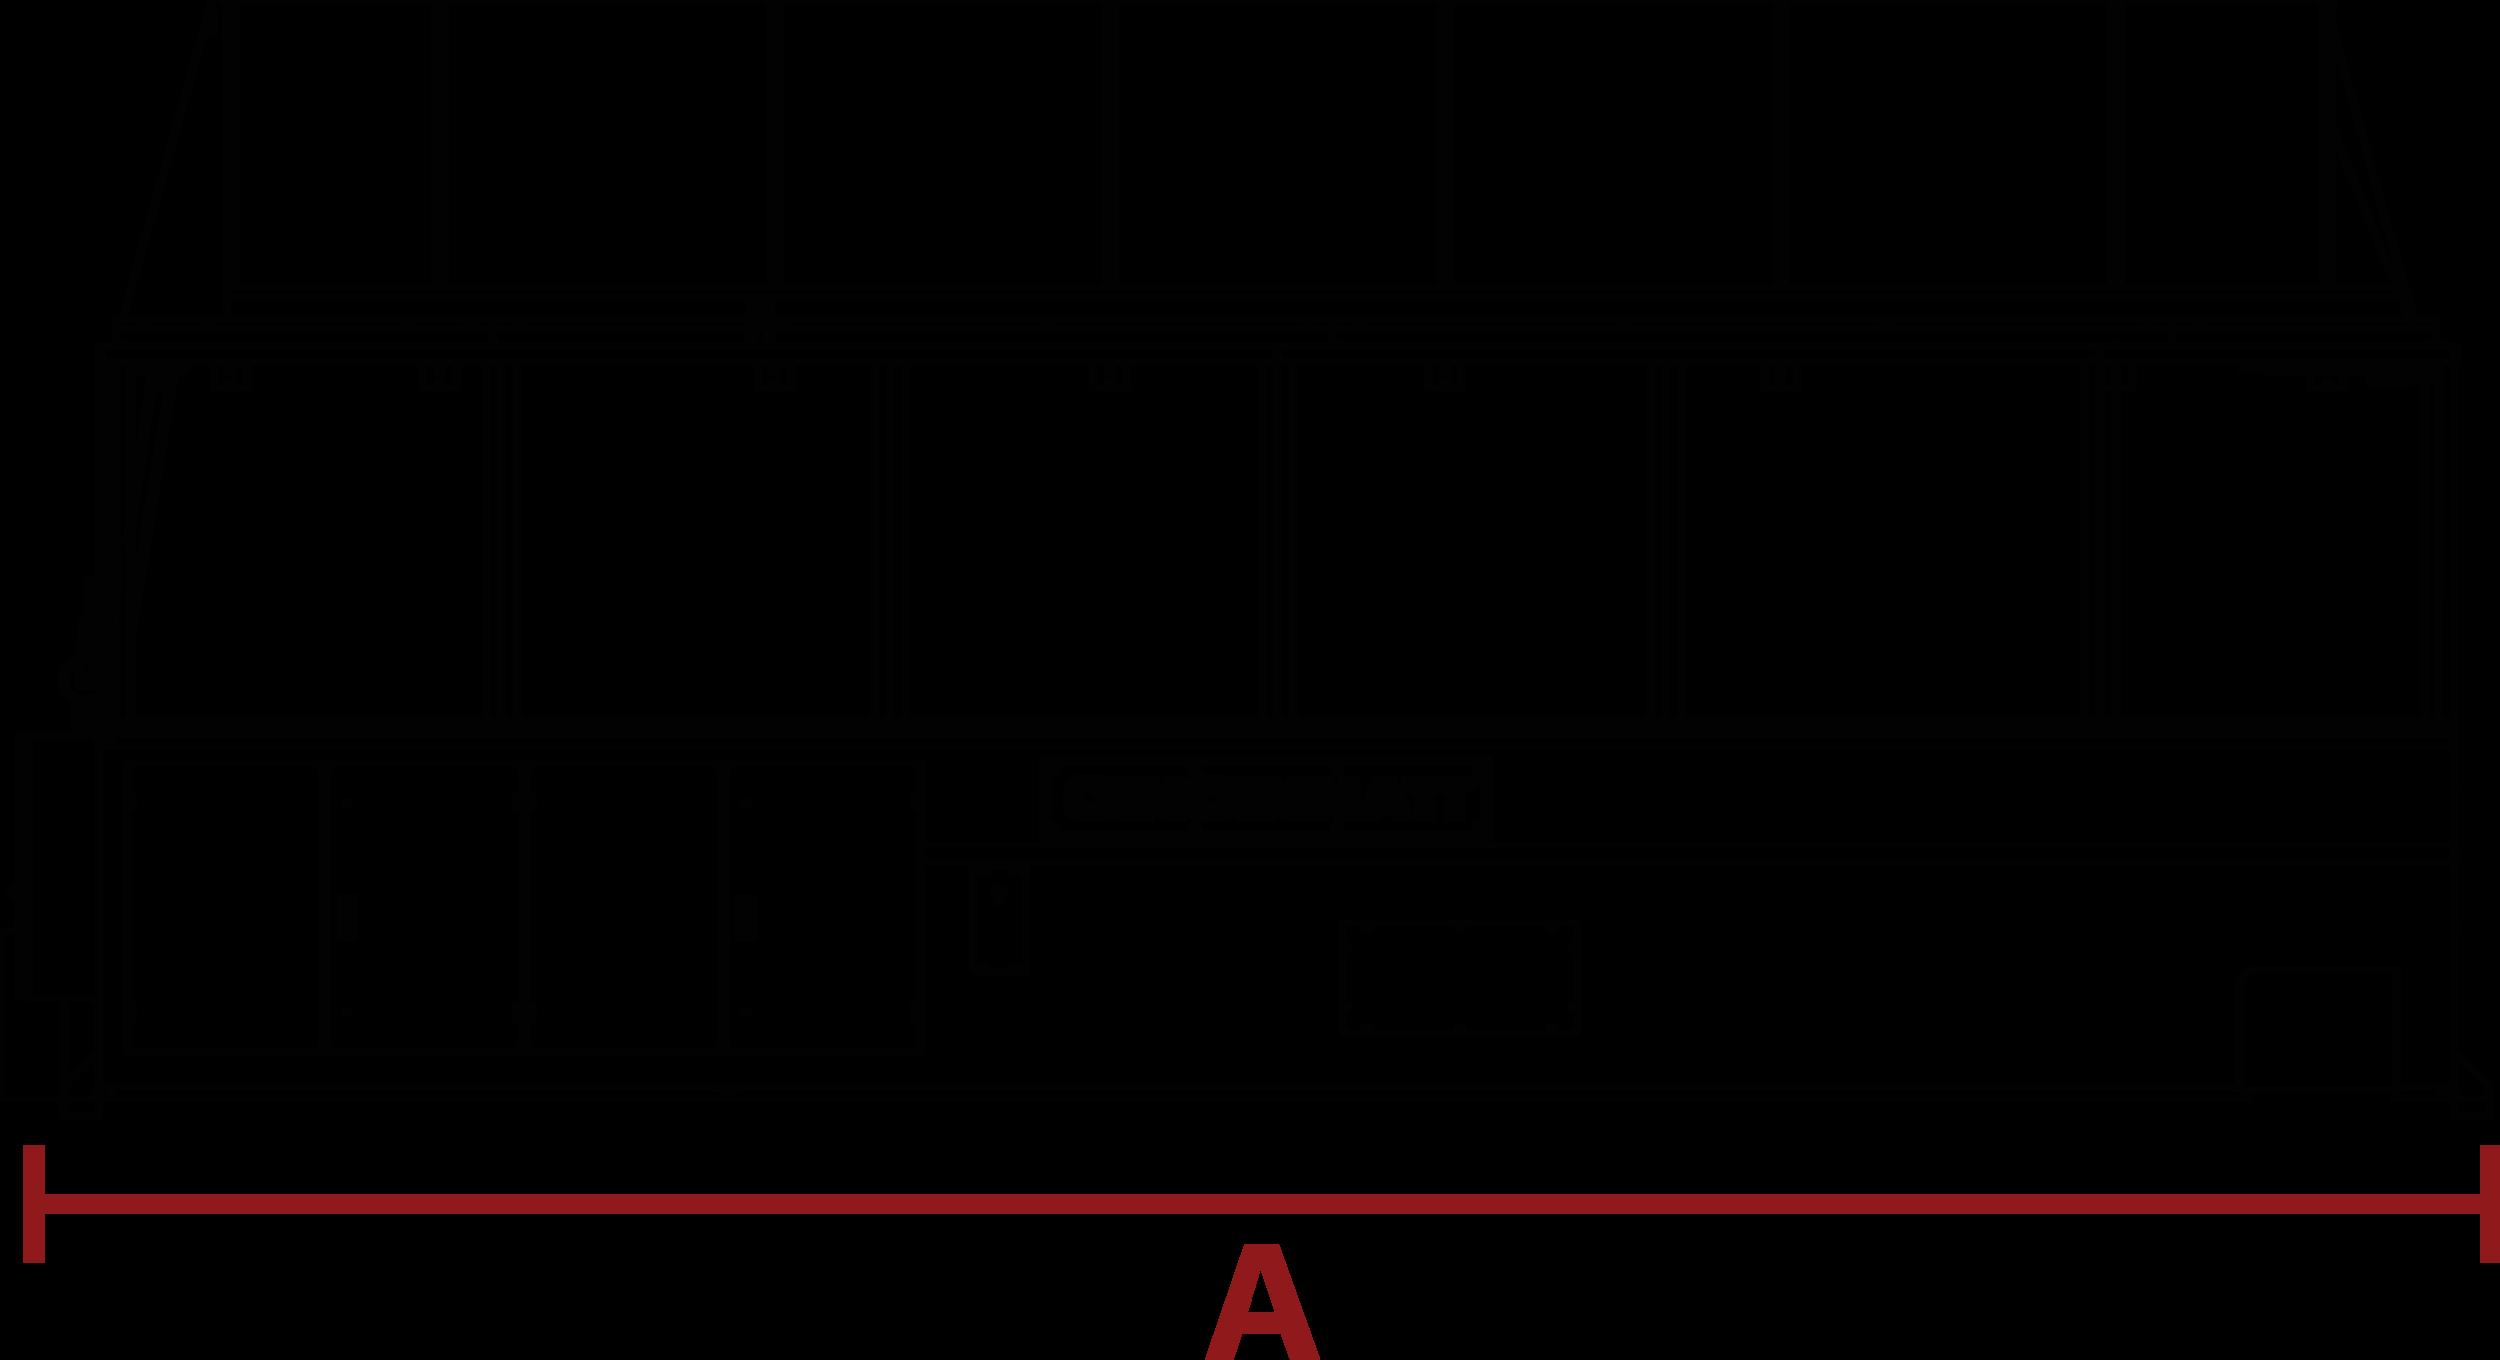 BAAM Dimension Outline (side)